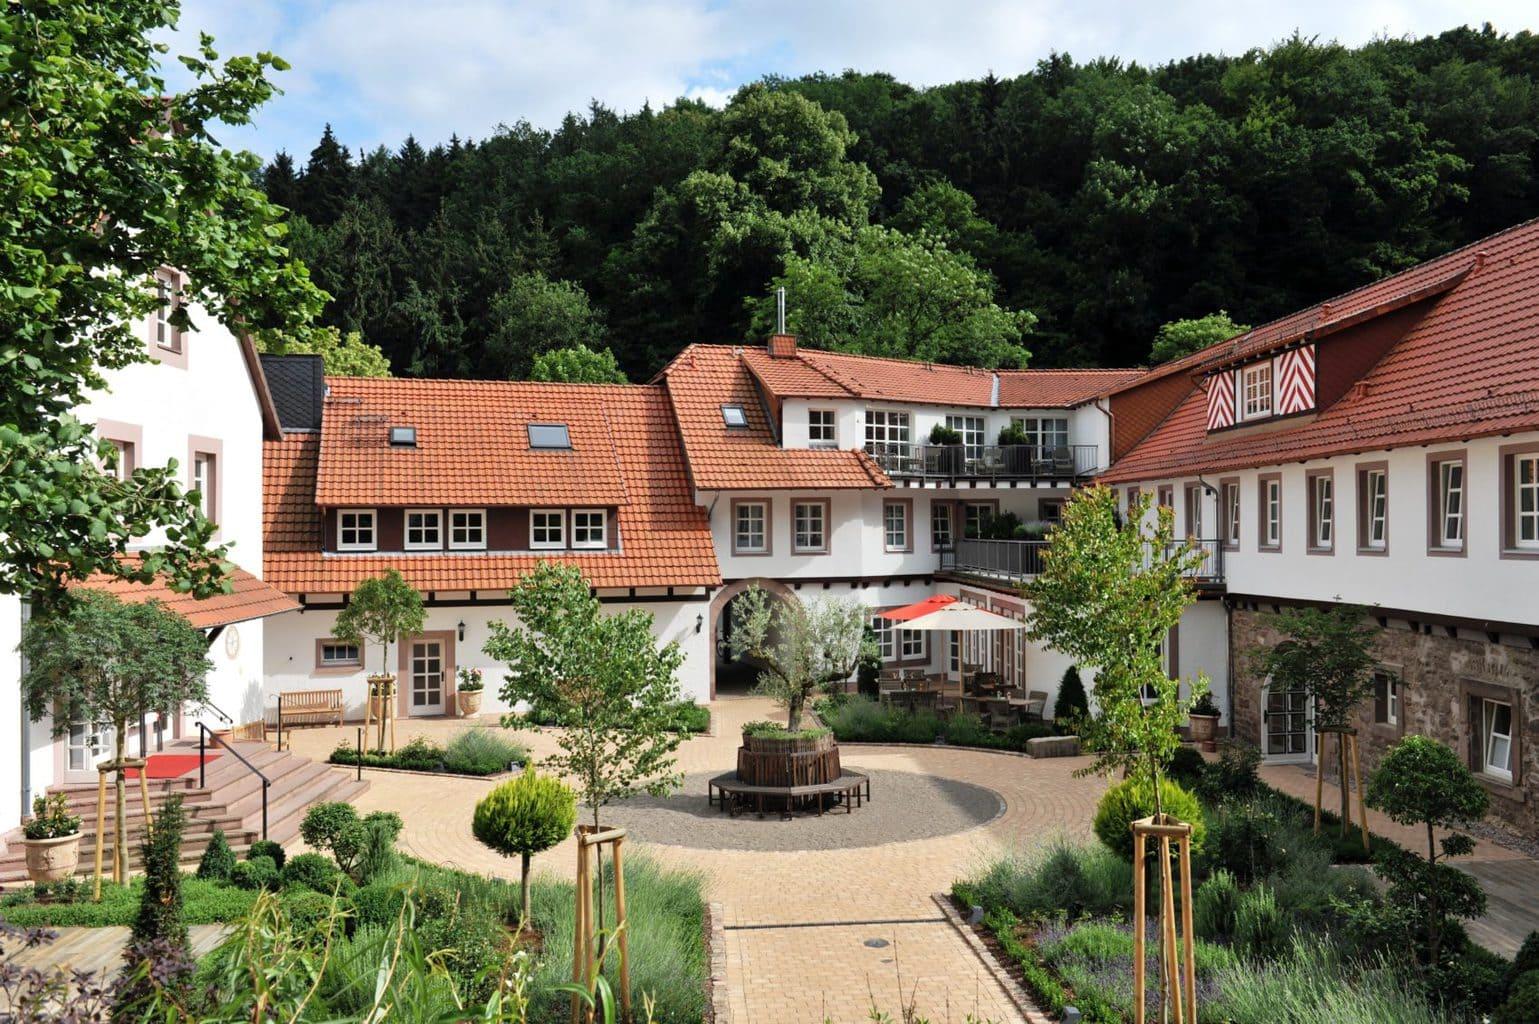 Burghotel Hardenberg